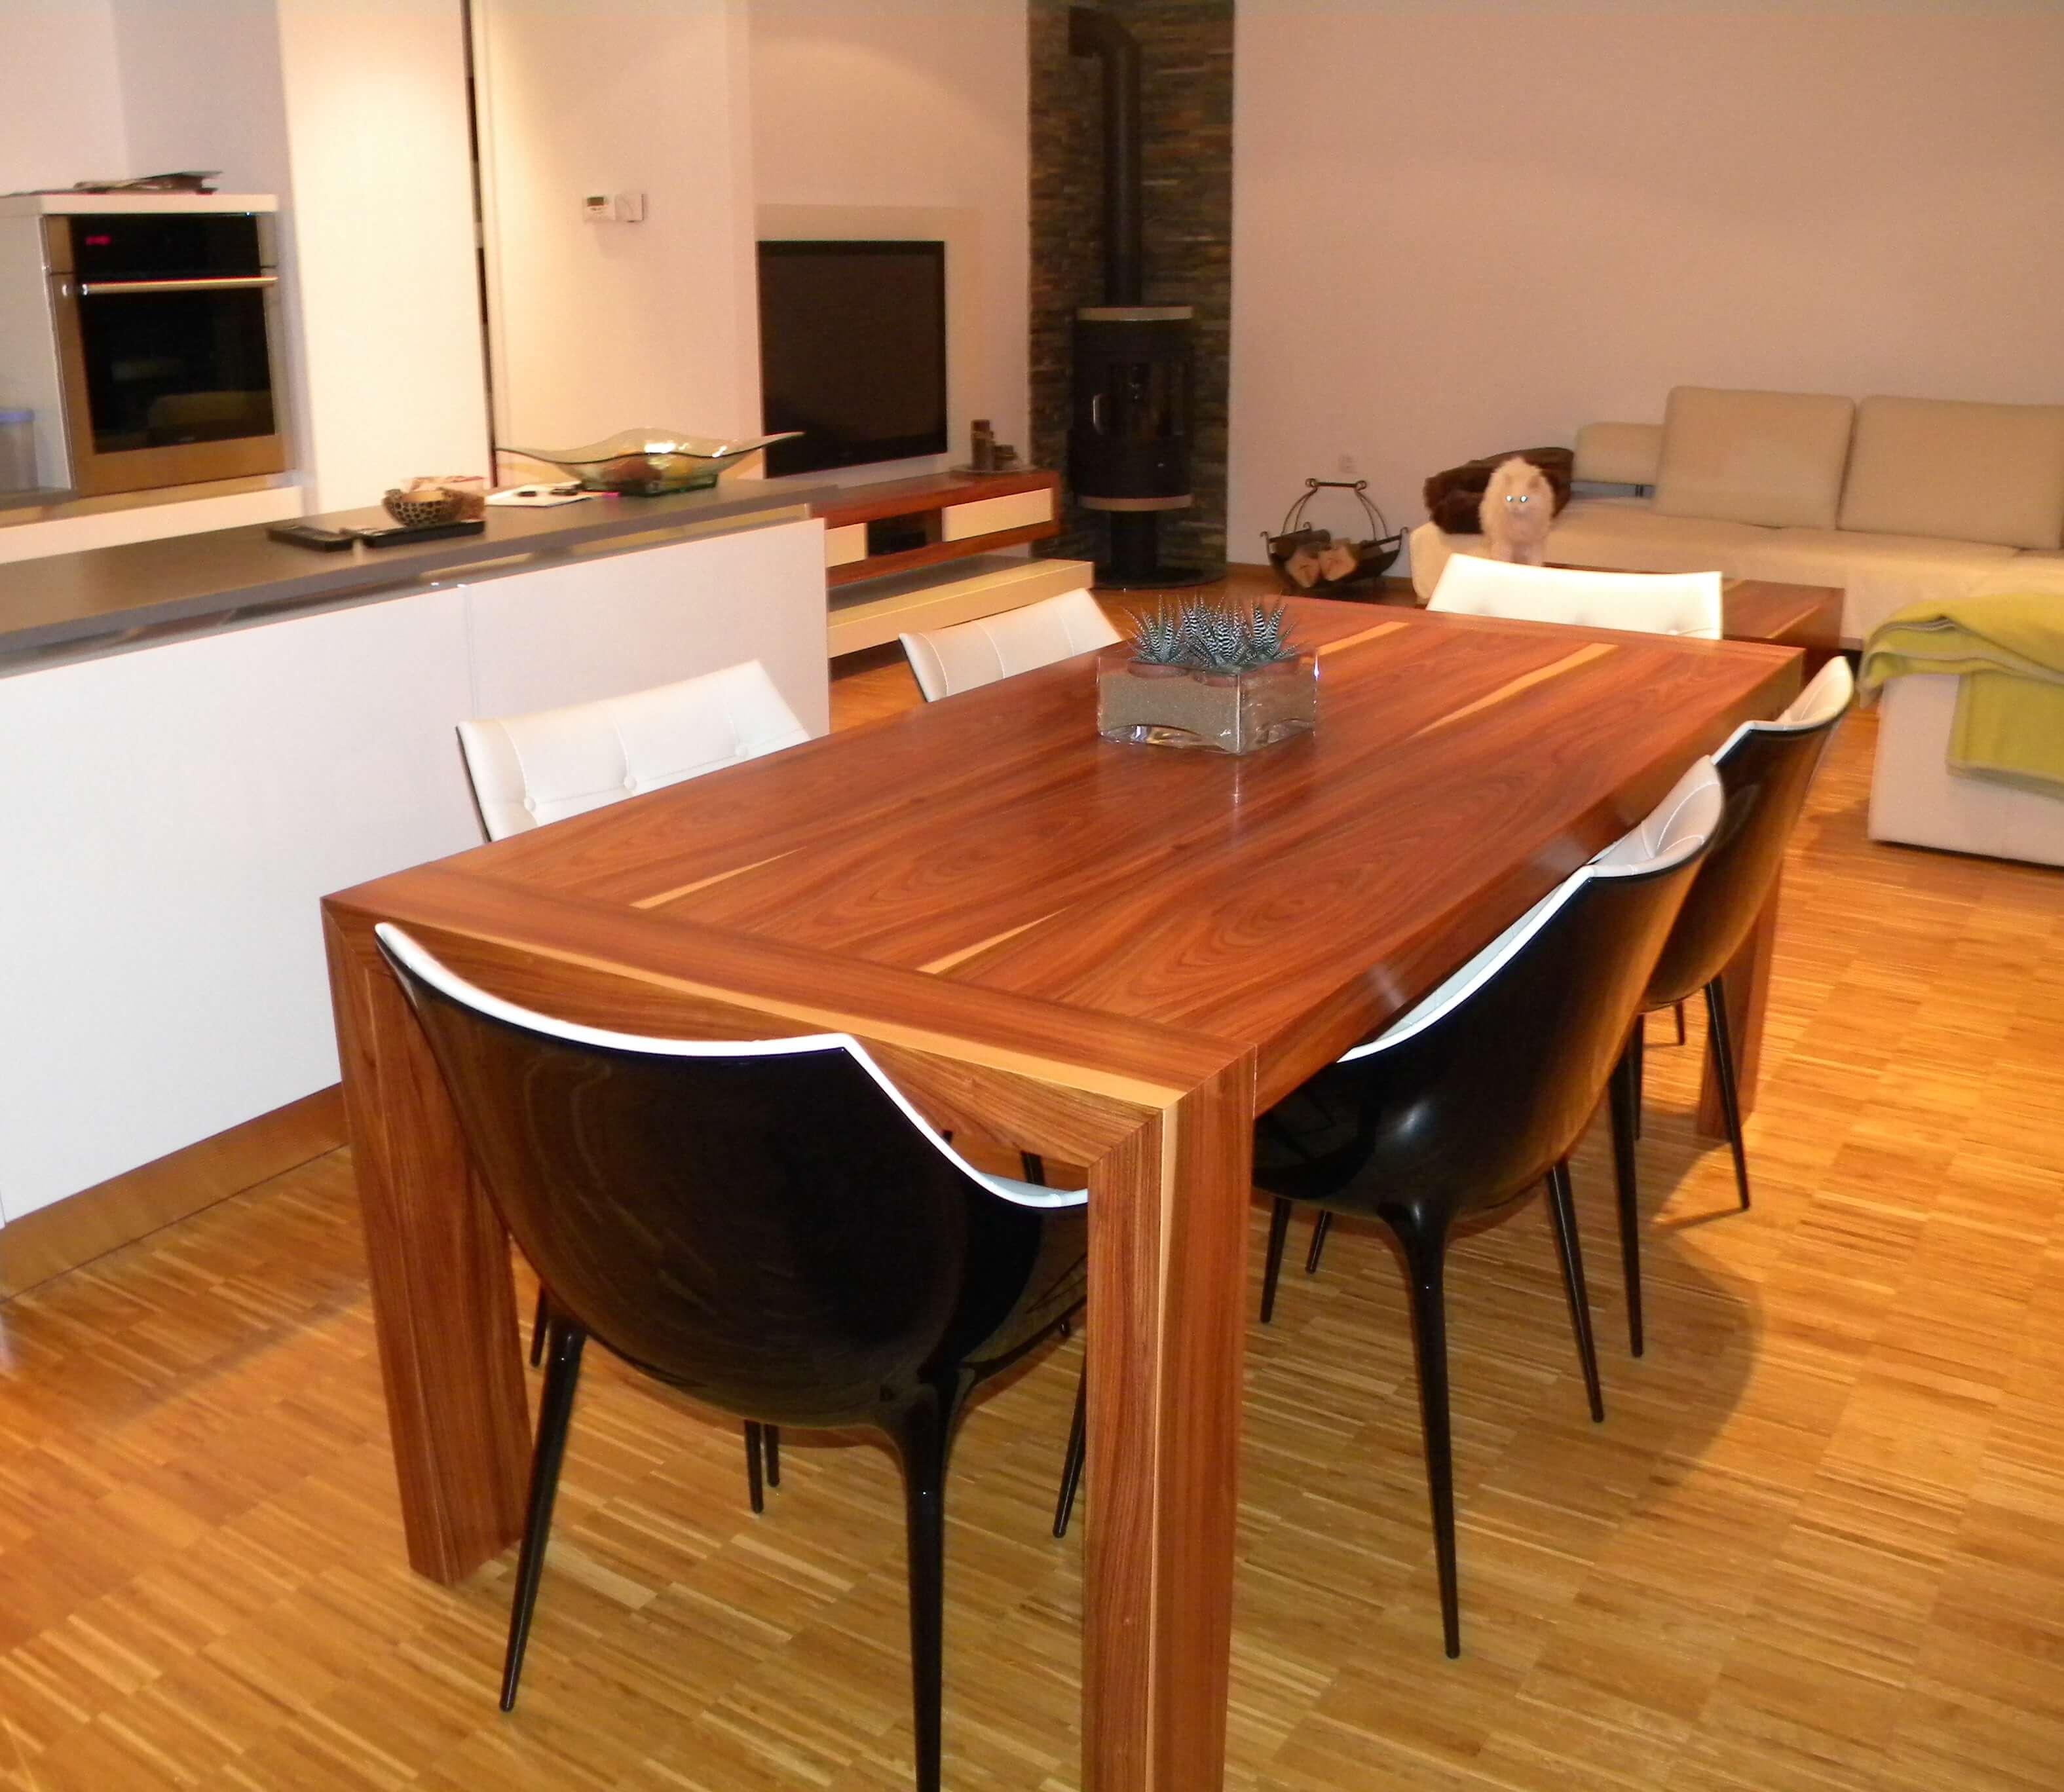 furnirana miza za jedilnico po naročilu